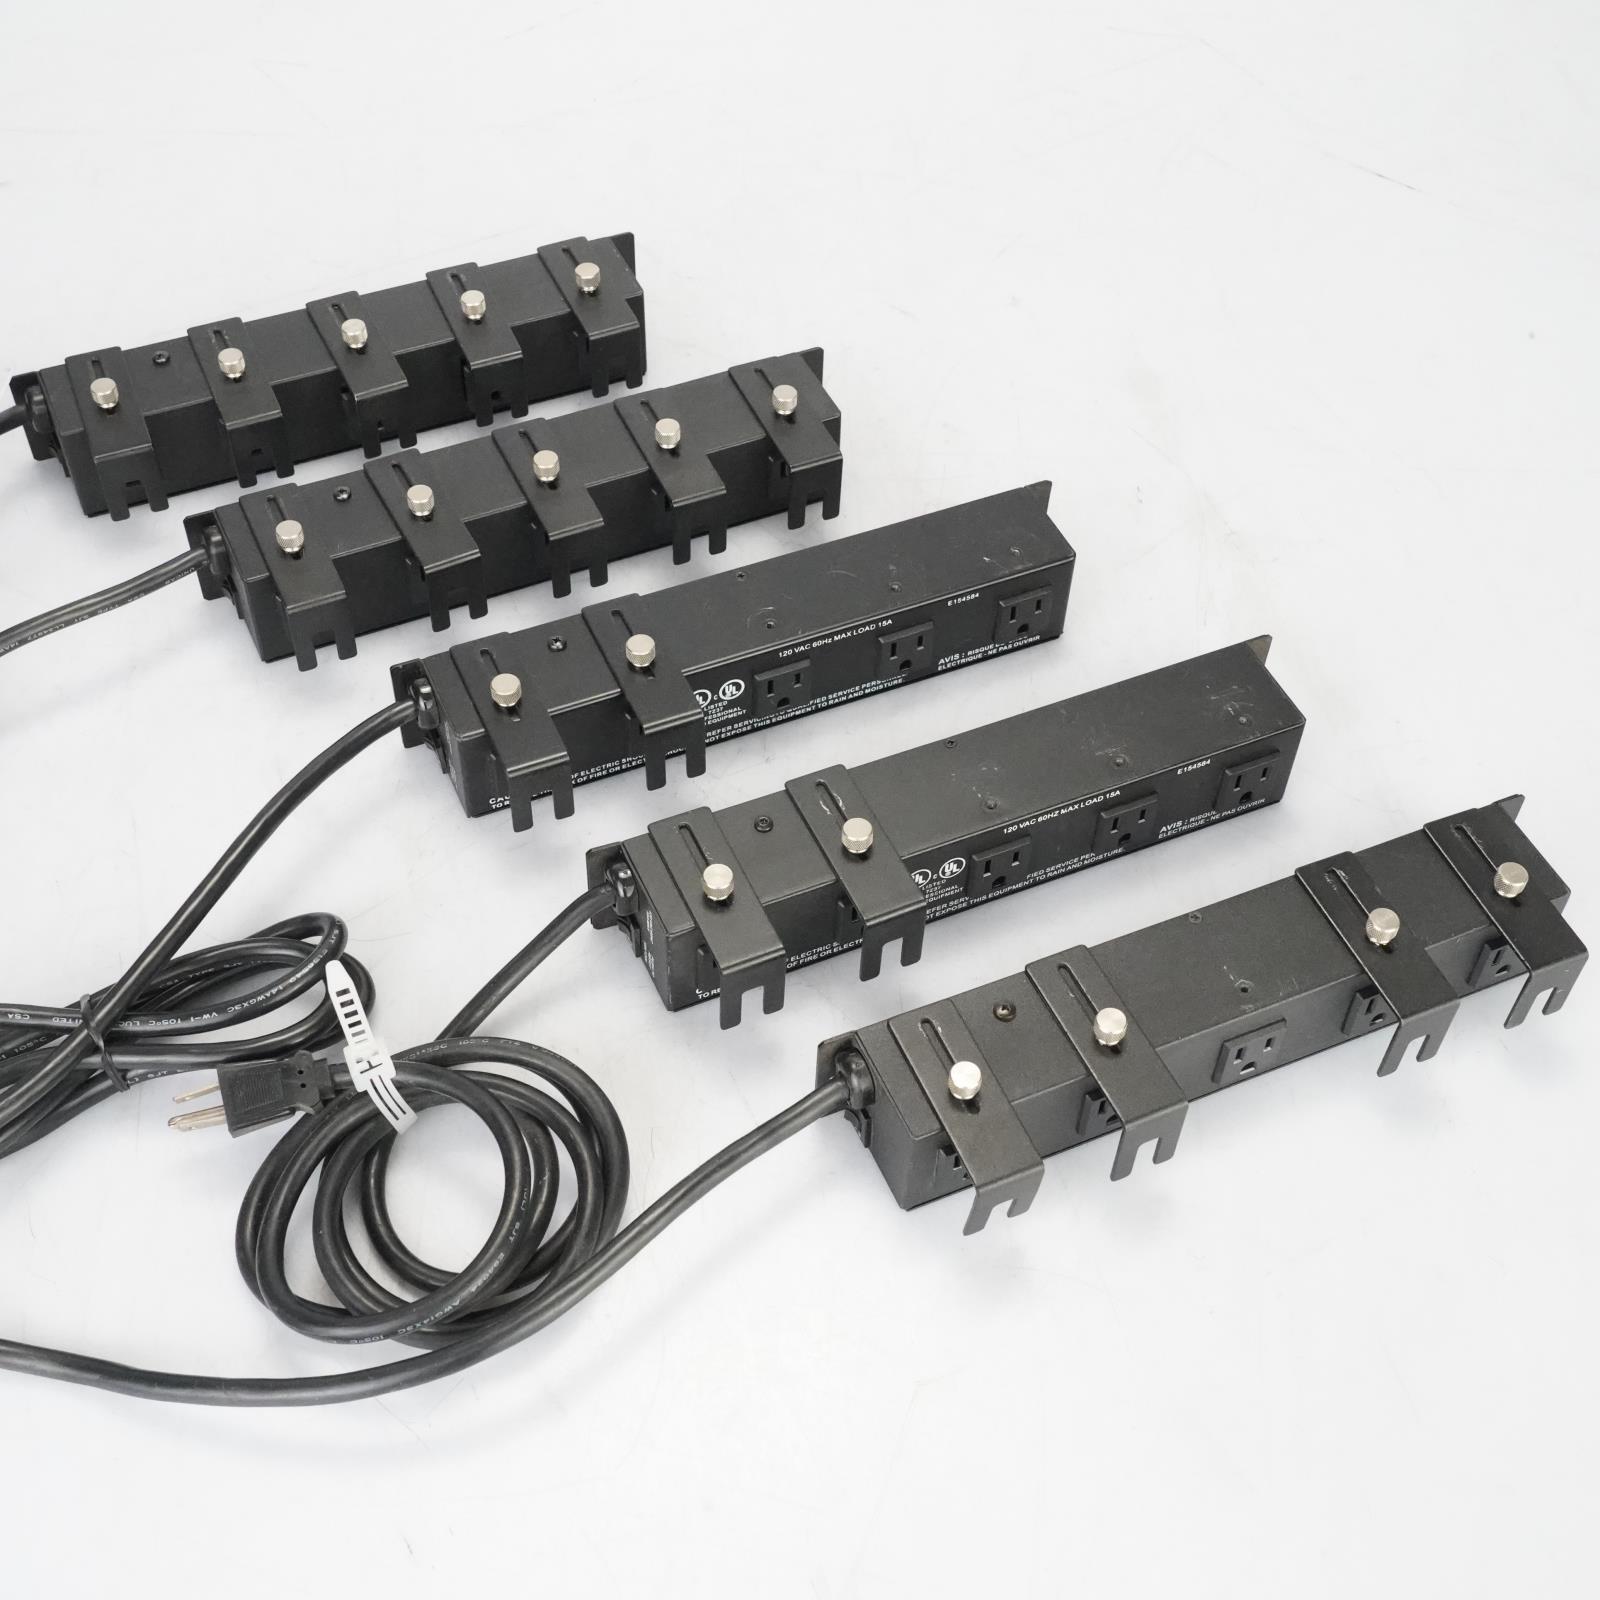 5 Furman PlugLock 5-Outlet 15A Power Strips #38696